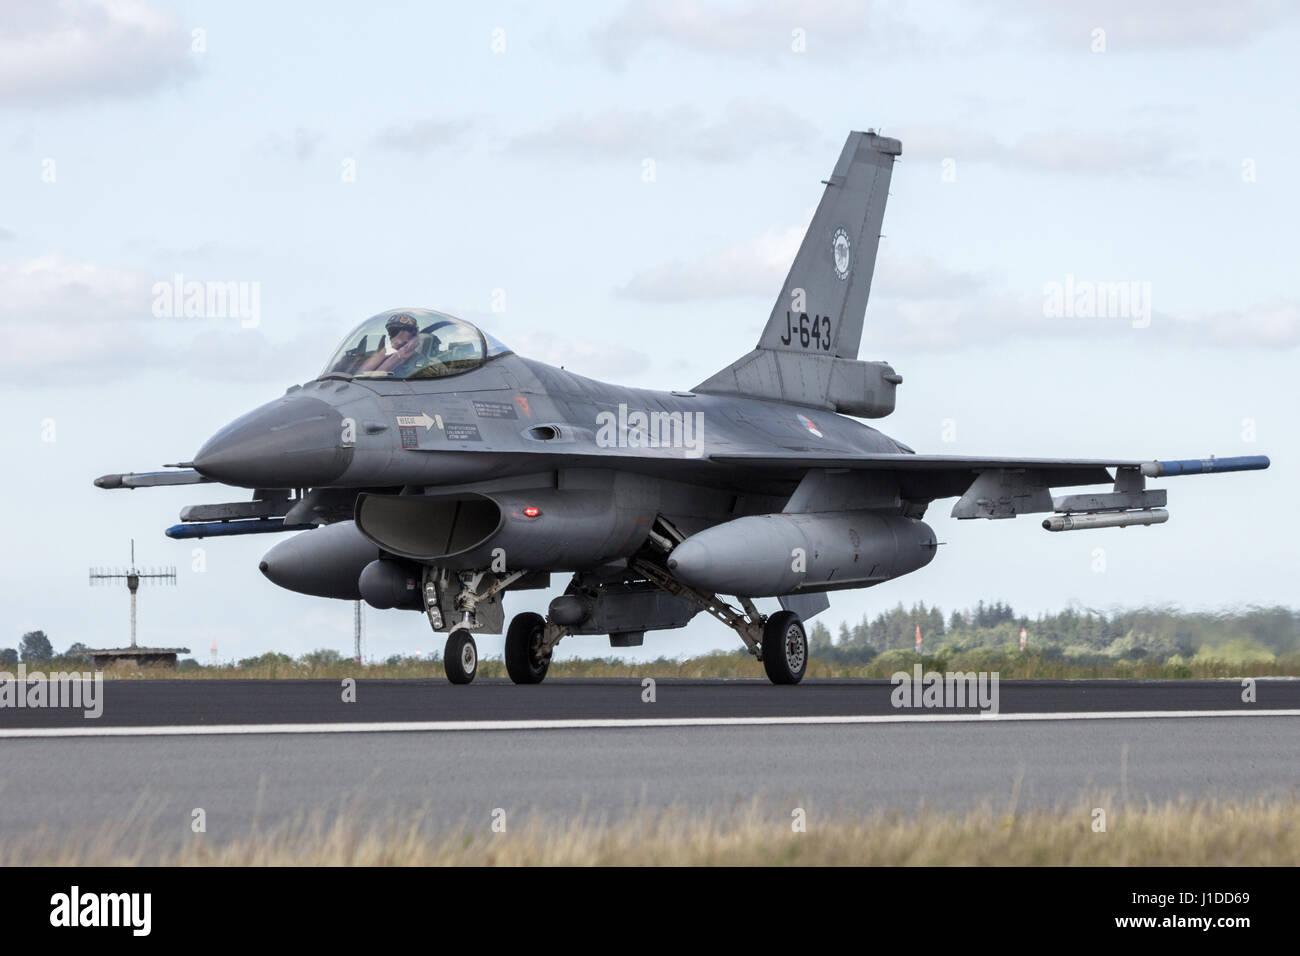 SCHLESWIG-JAGEL, GERMANY - JUN 23, 2014: Royal Netherlands Air Force F-16 fighter jet plane during the NATO Tiger - Stock Image